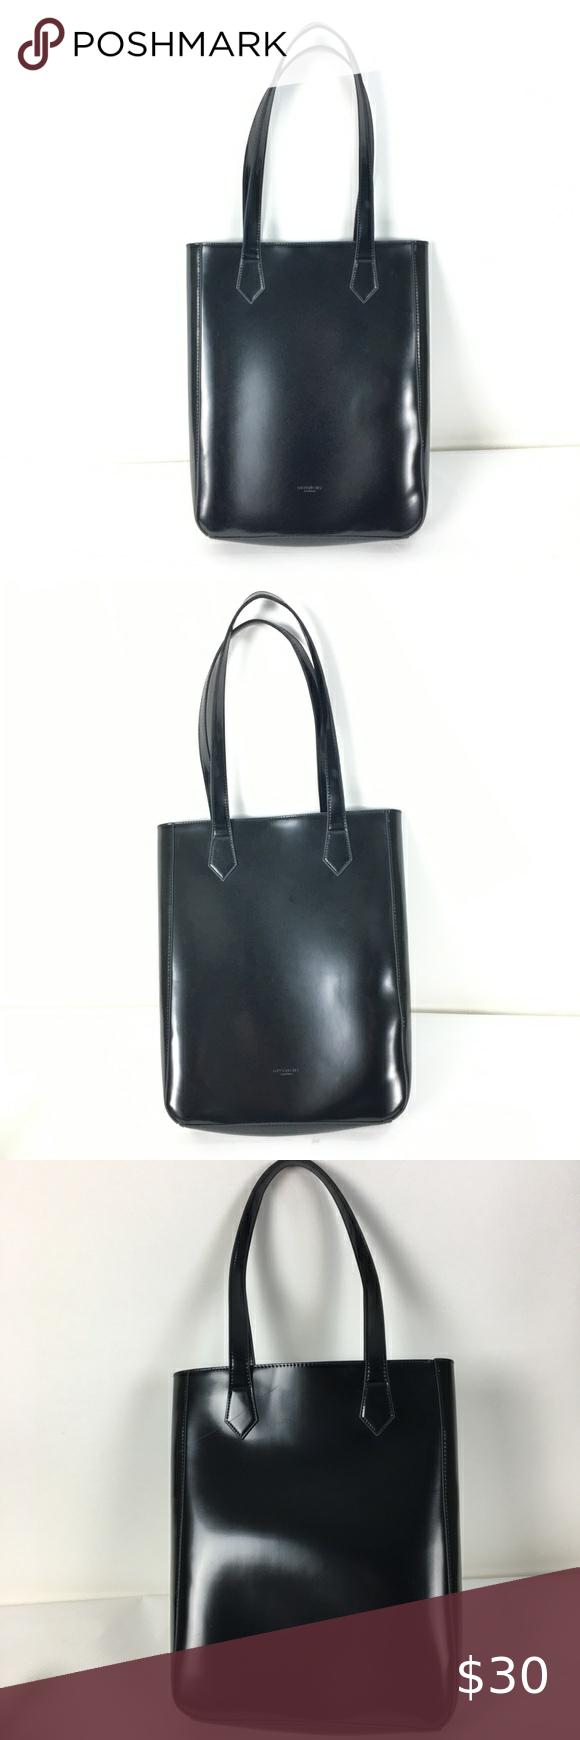 Givenchy Parfums Black Tote Bag Black Tote Bag Bags Black Tote